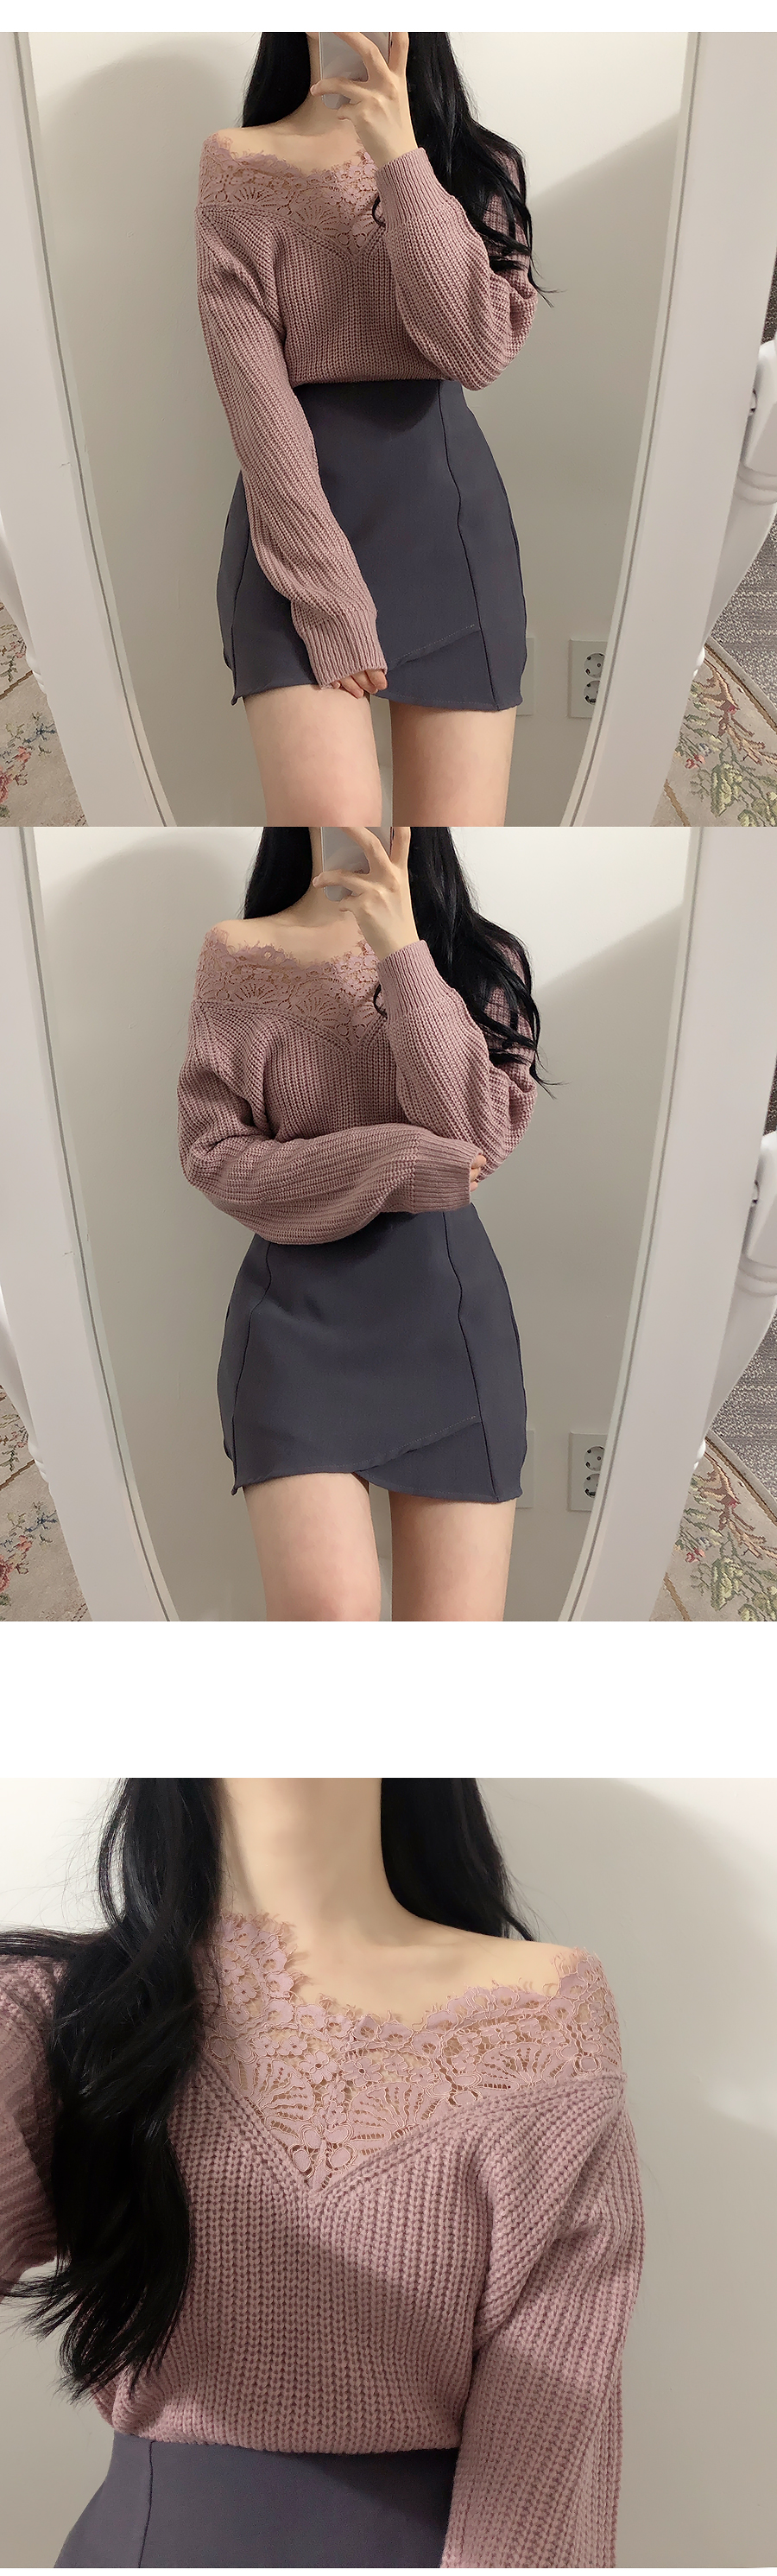 Ena Tulip Skirt